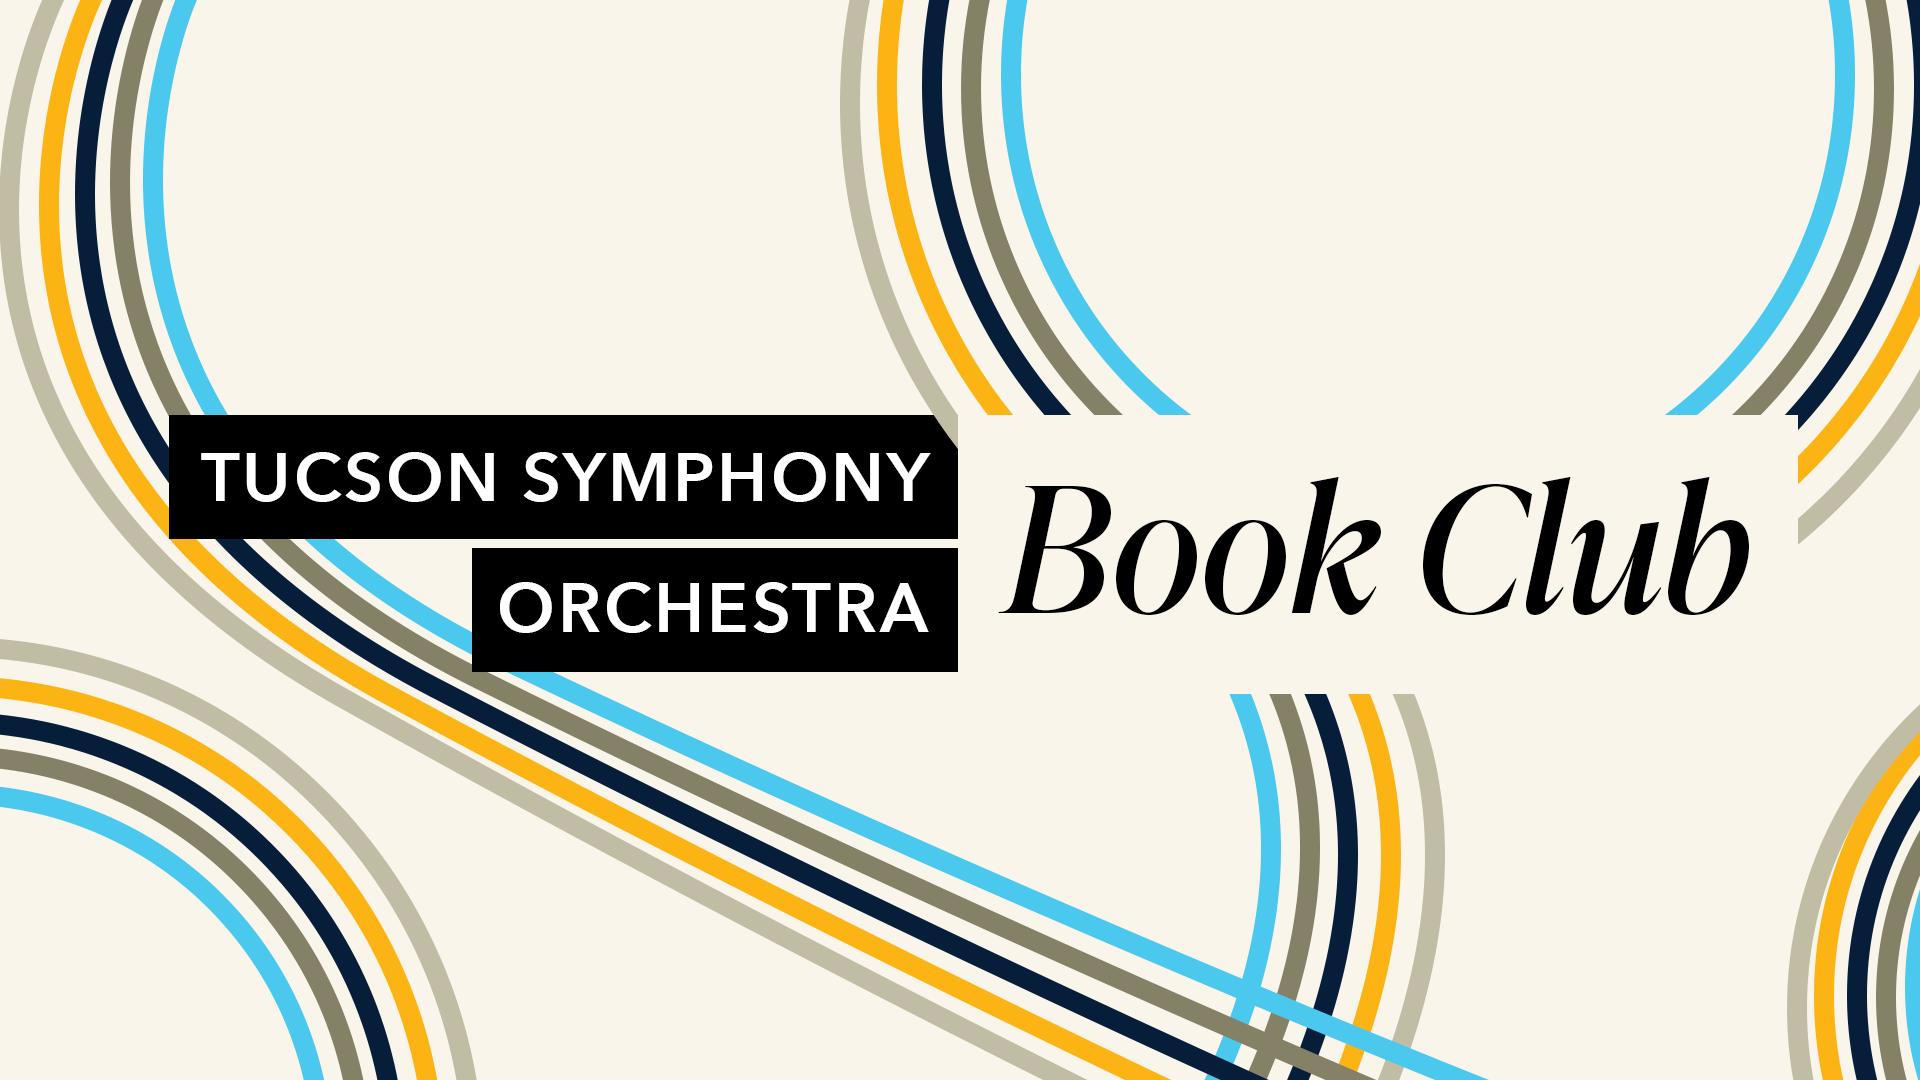 Tucson Symphony Orchestra Book Club